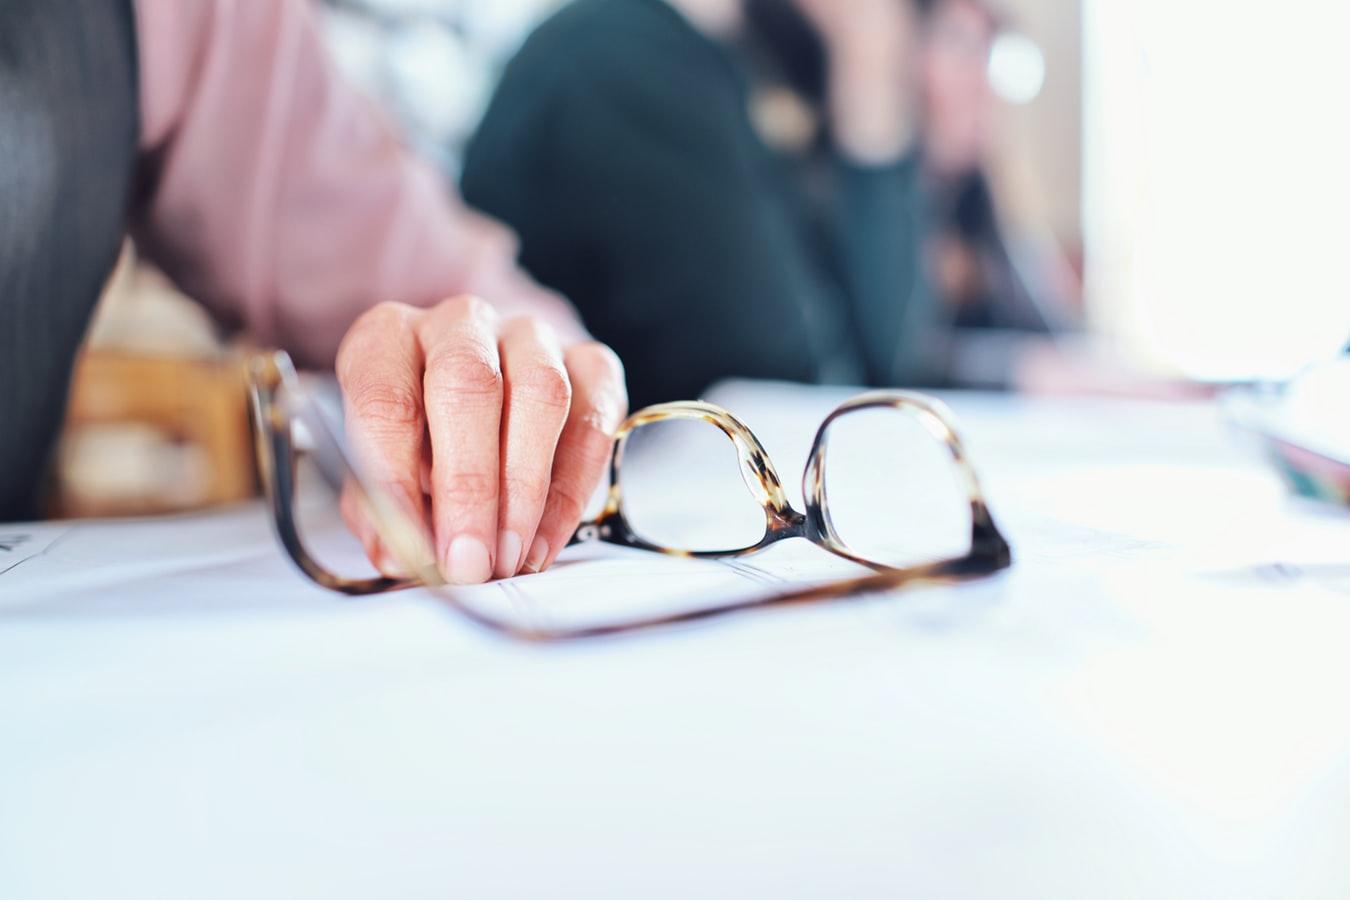 Nezabúdajte ani na dezinfikovanie okuliarov. / Foto Unsplash